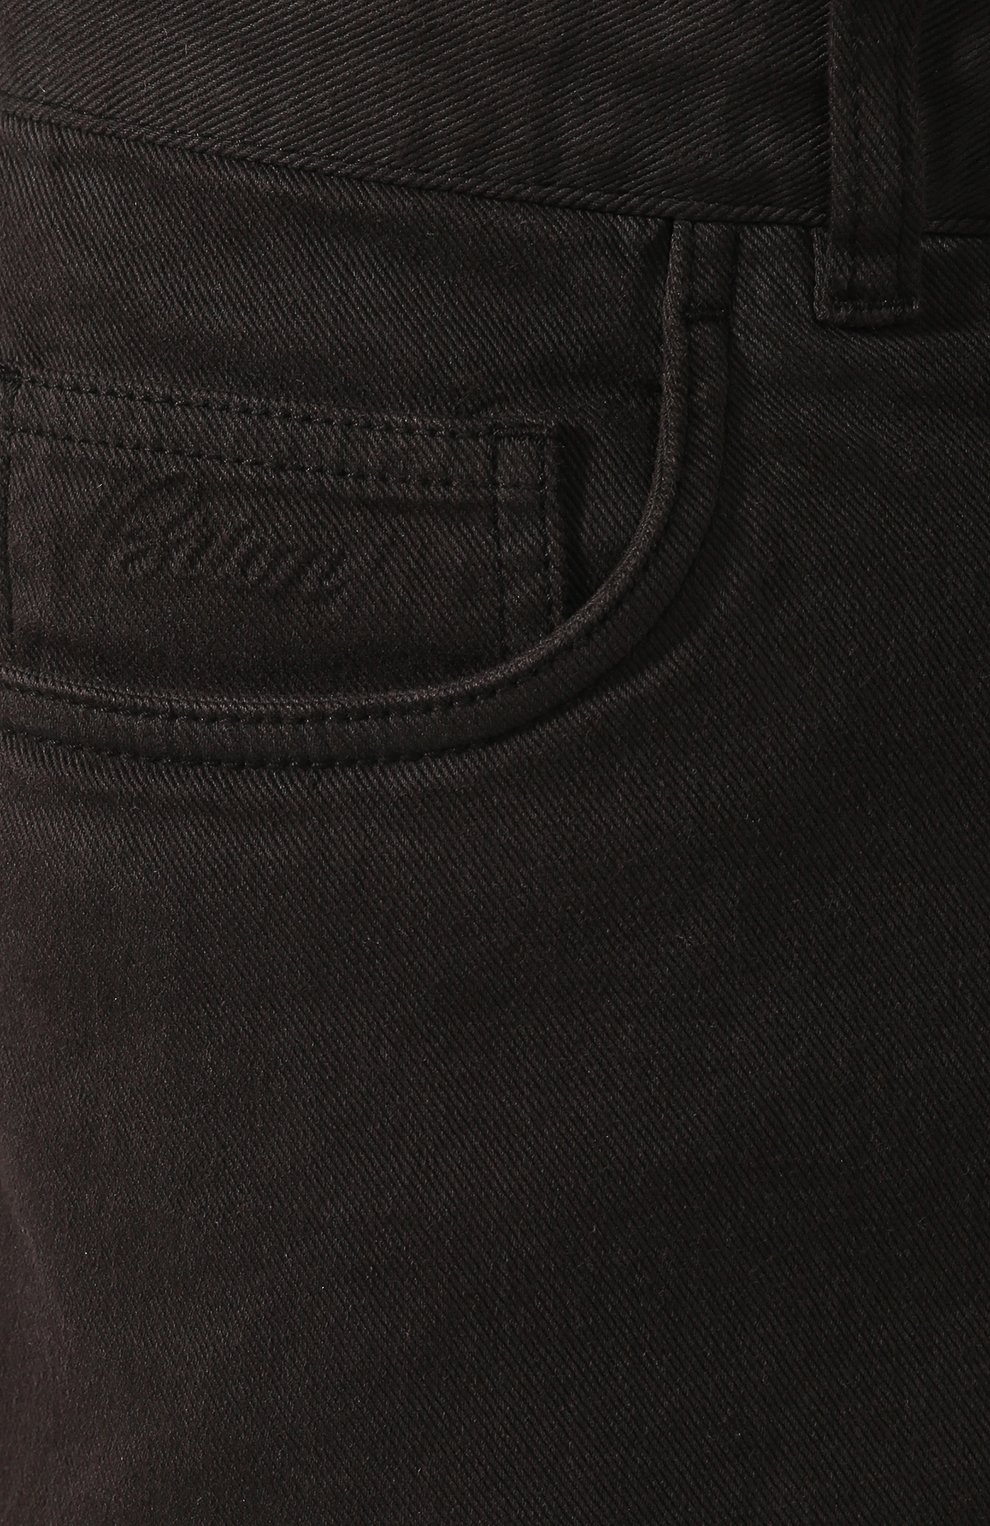 Мужские джинсы BRIONI темно-зеленого цвета, арт. SPNJ0M/08T01/STELVI0   Фото 5